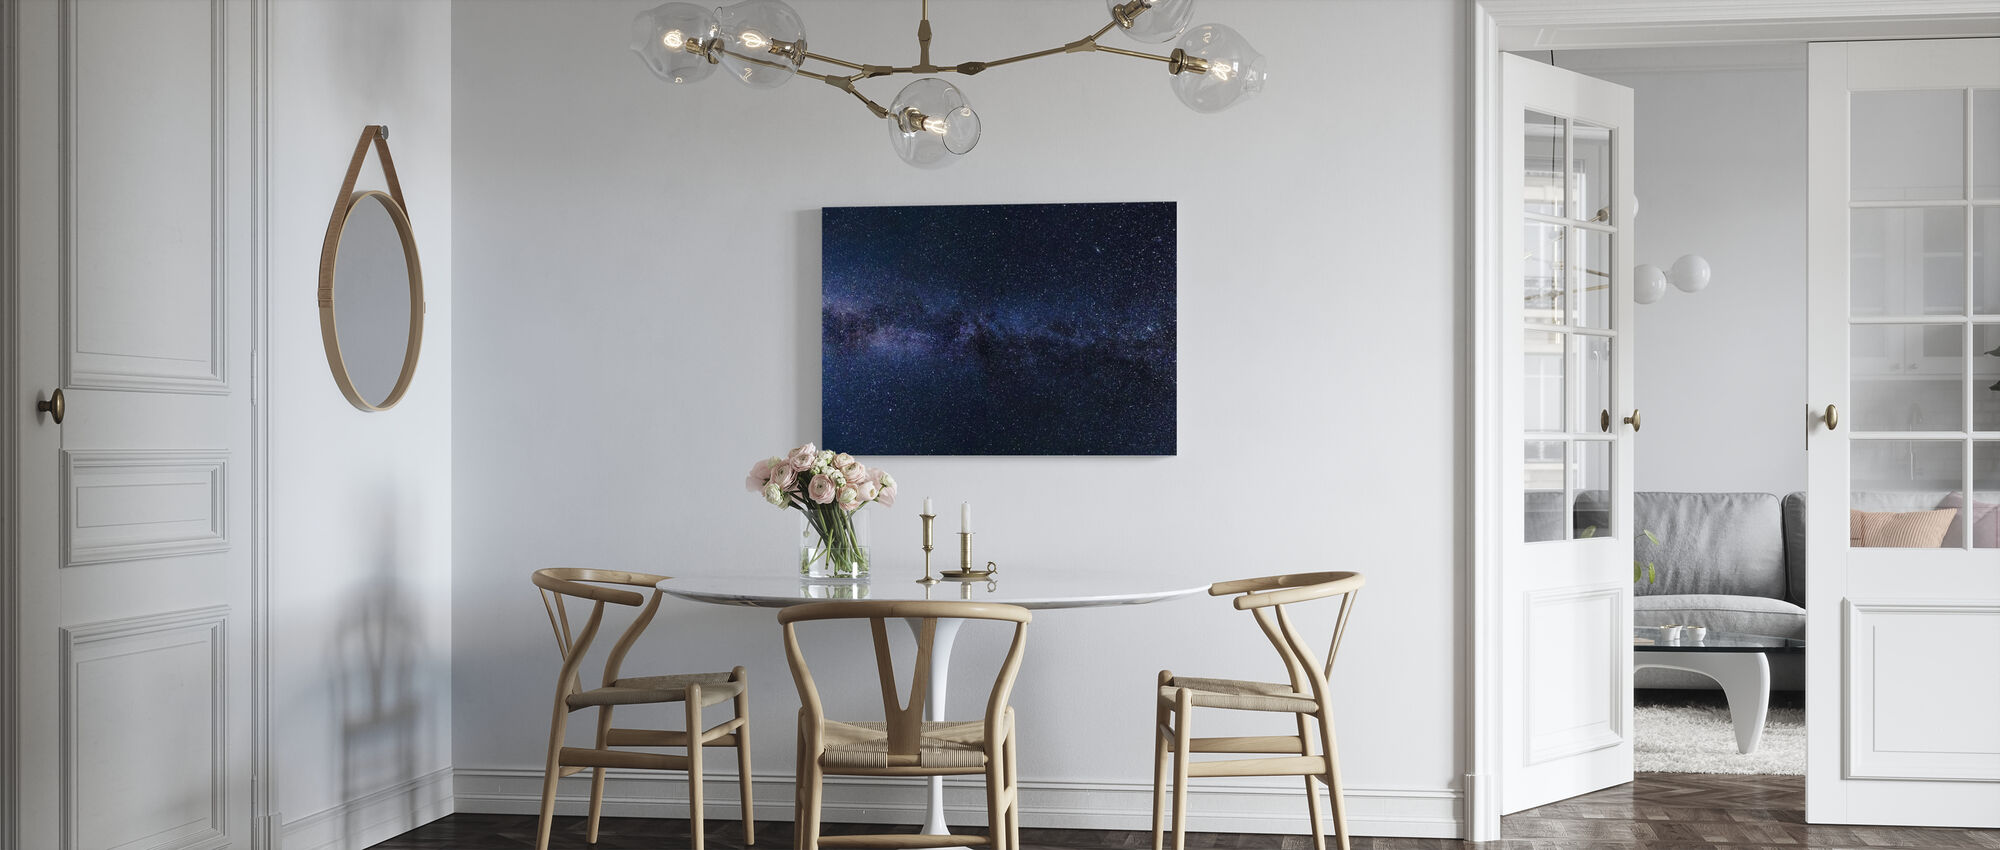 Mystical Starry Sky - Canvas print - Kitchen